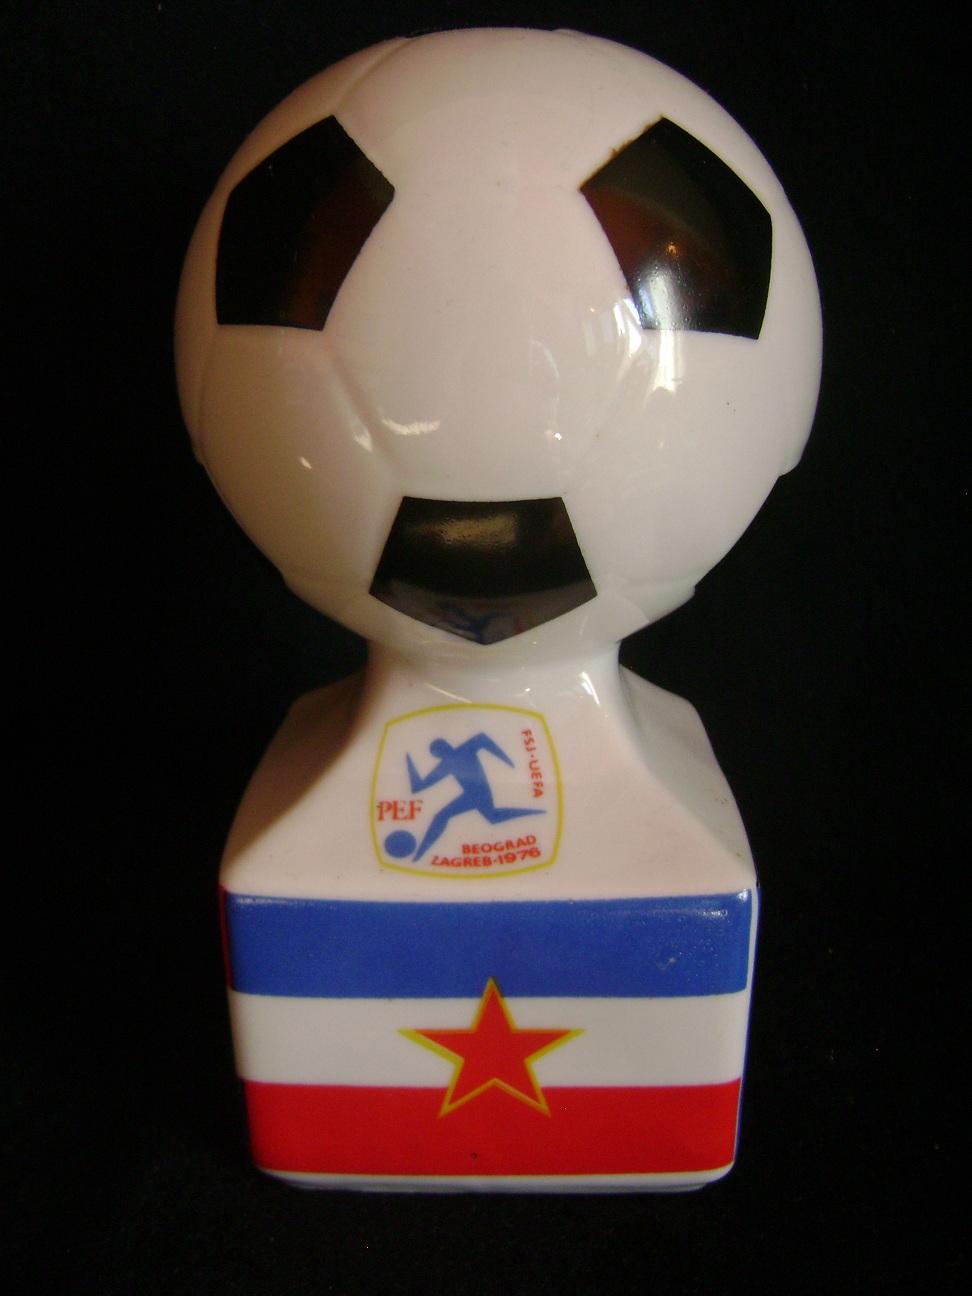 Trofej_Prvenstvo_Evrope_u_fudbalu_1976__1.JPG